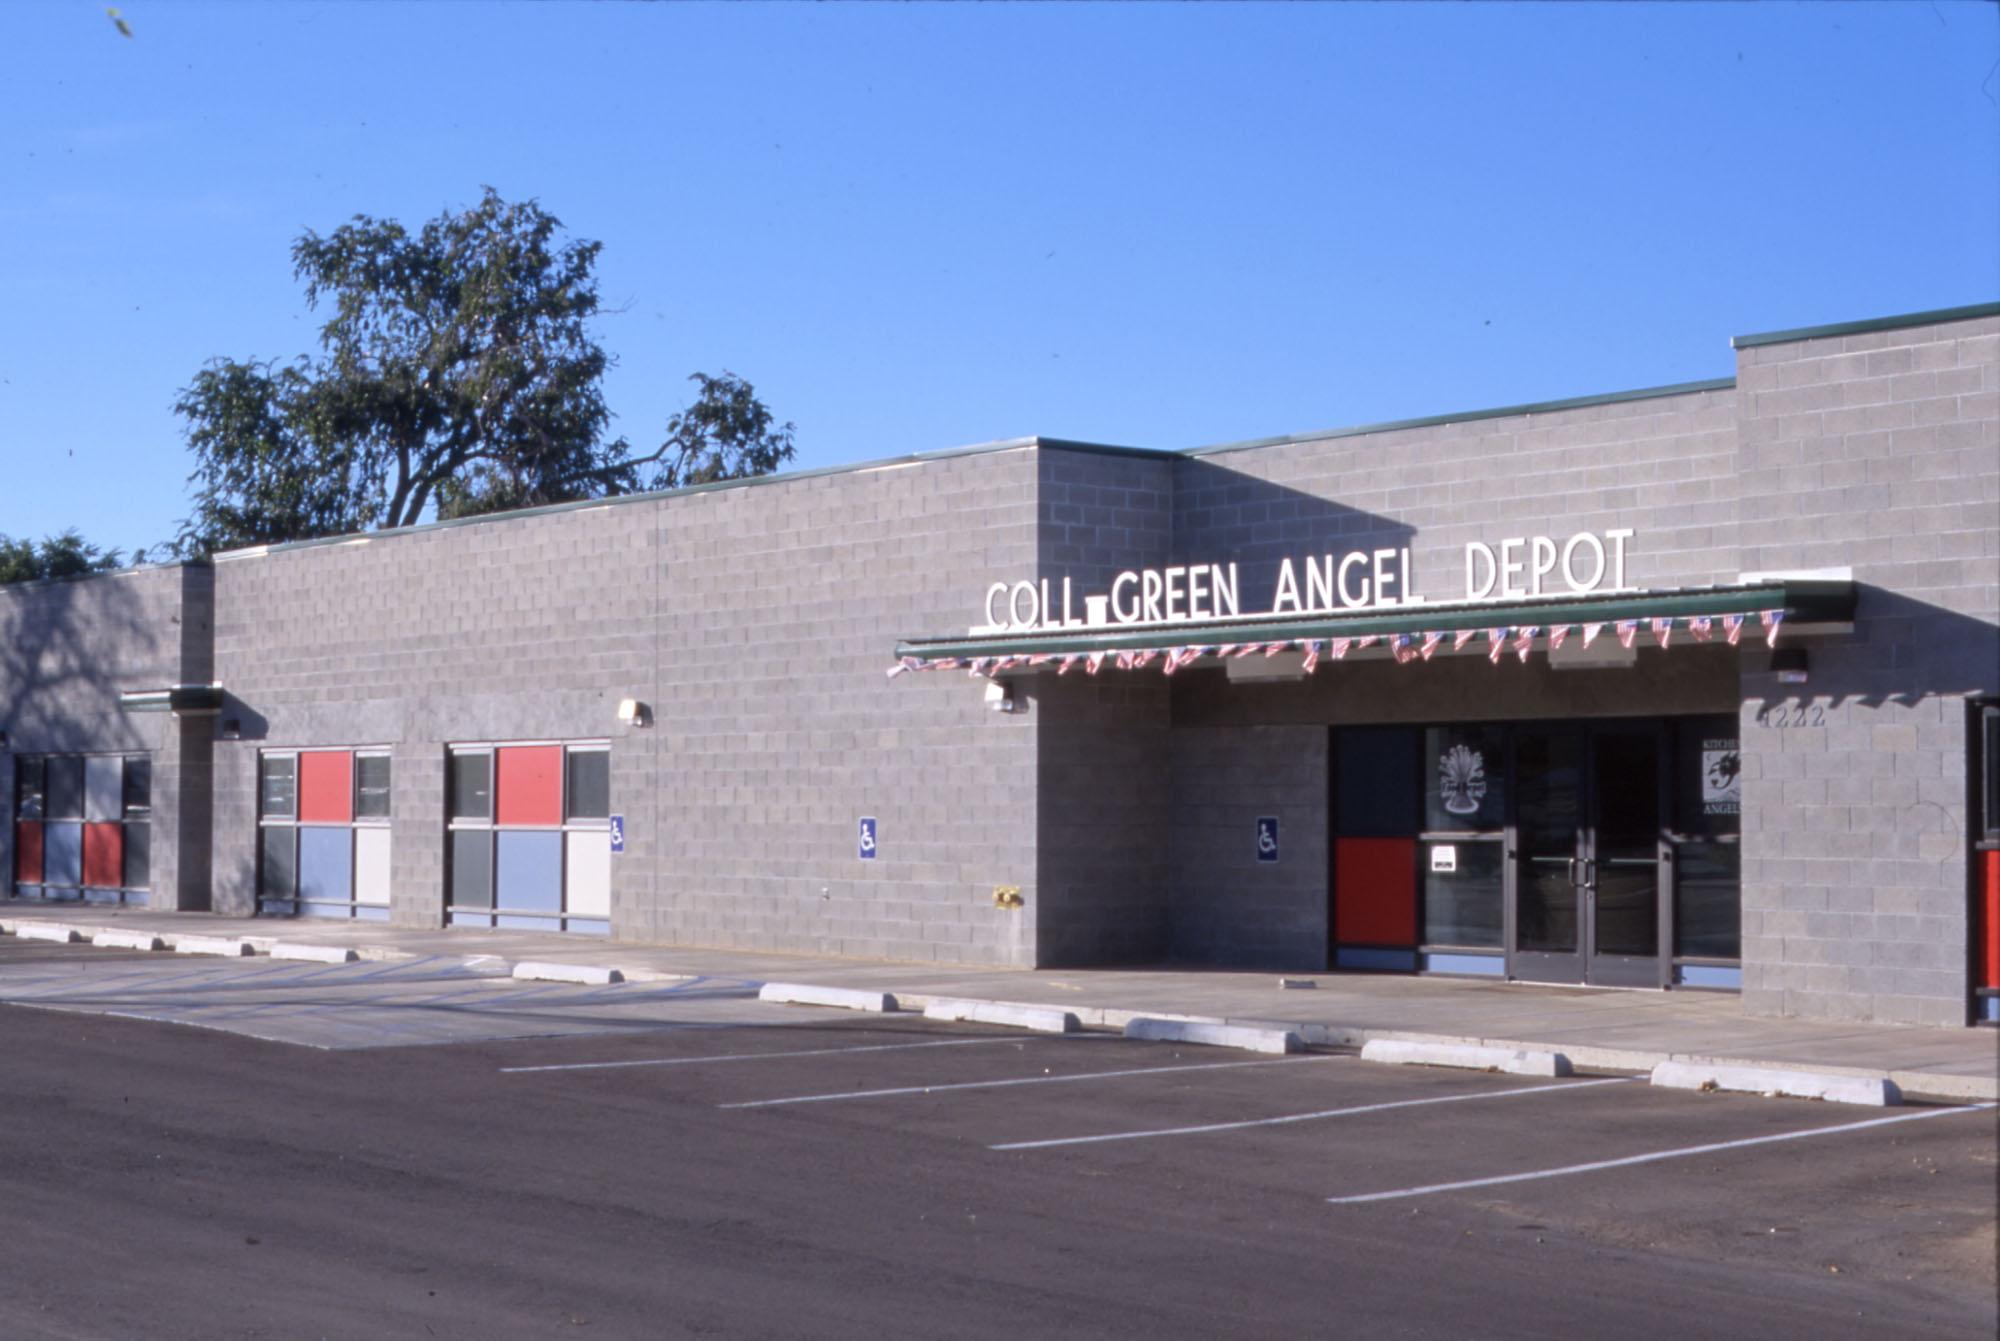 Coll Green Angel Depot - view from parking lot.jpg